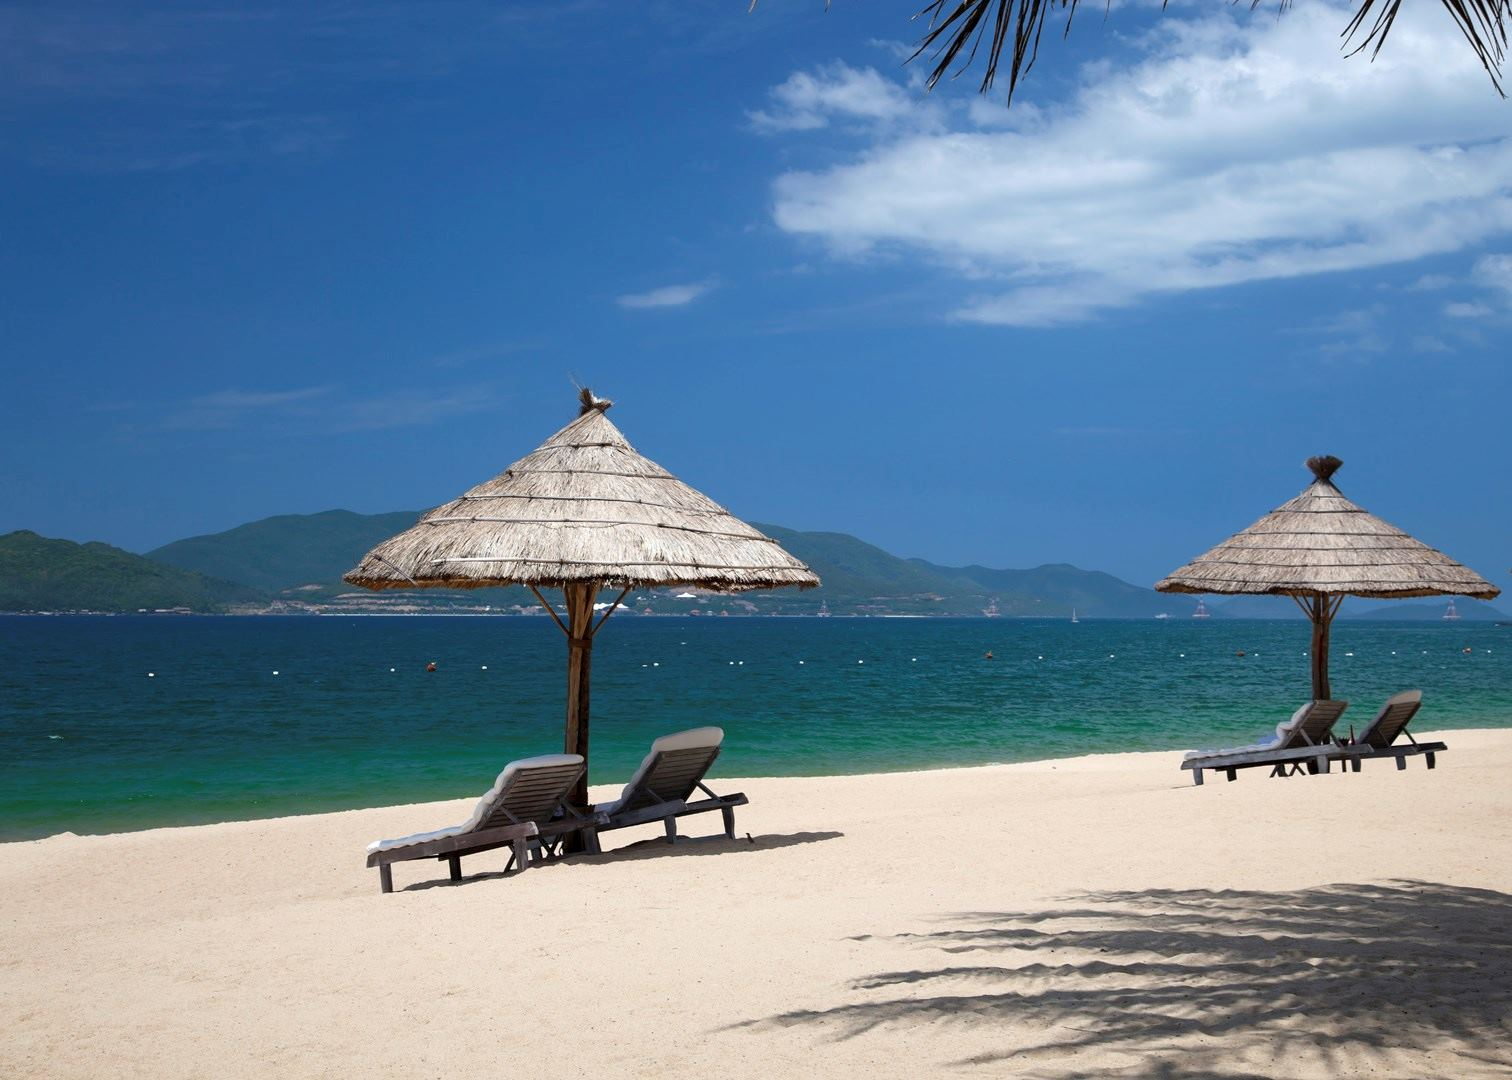 Vietnam's best beach resorts | Travel guide | Audley Travel